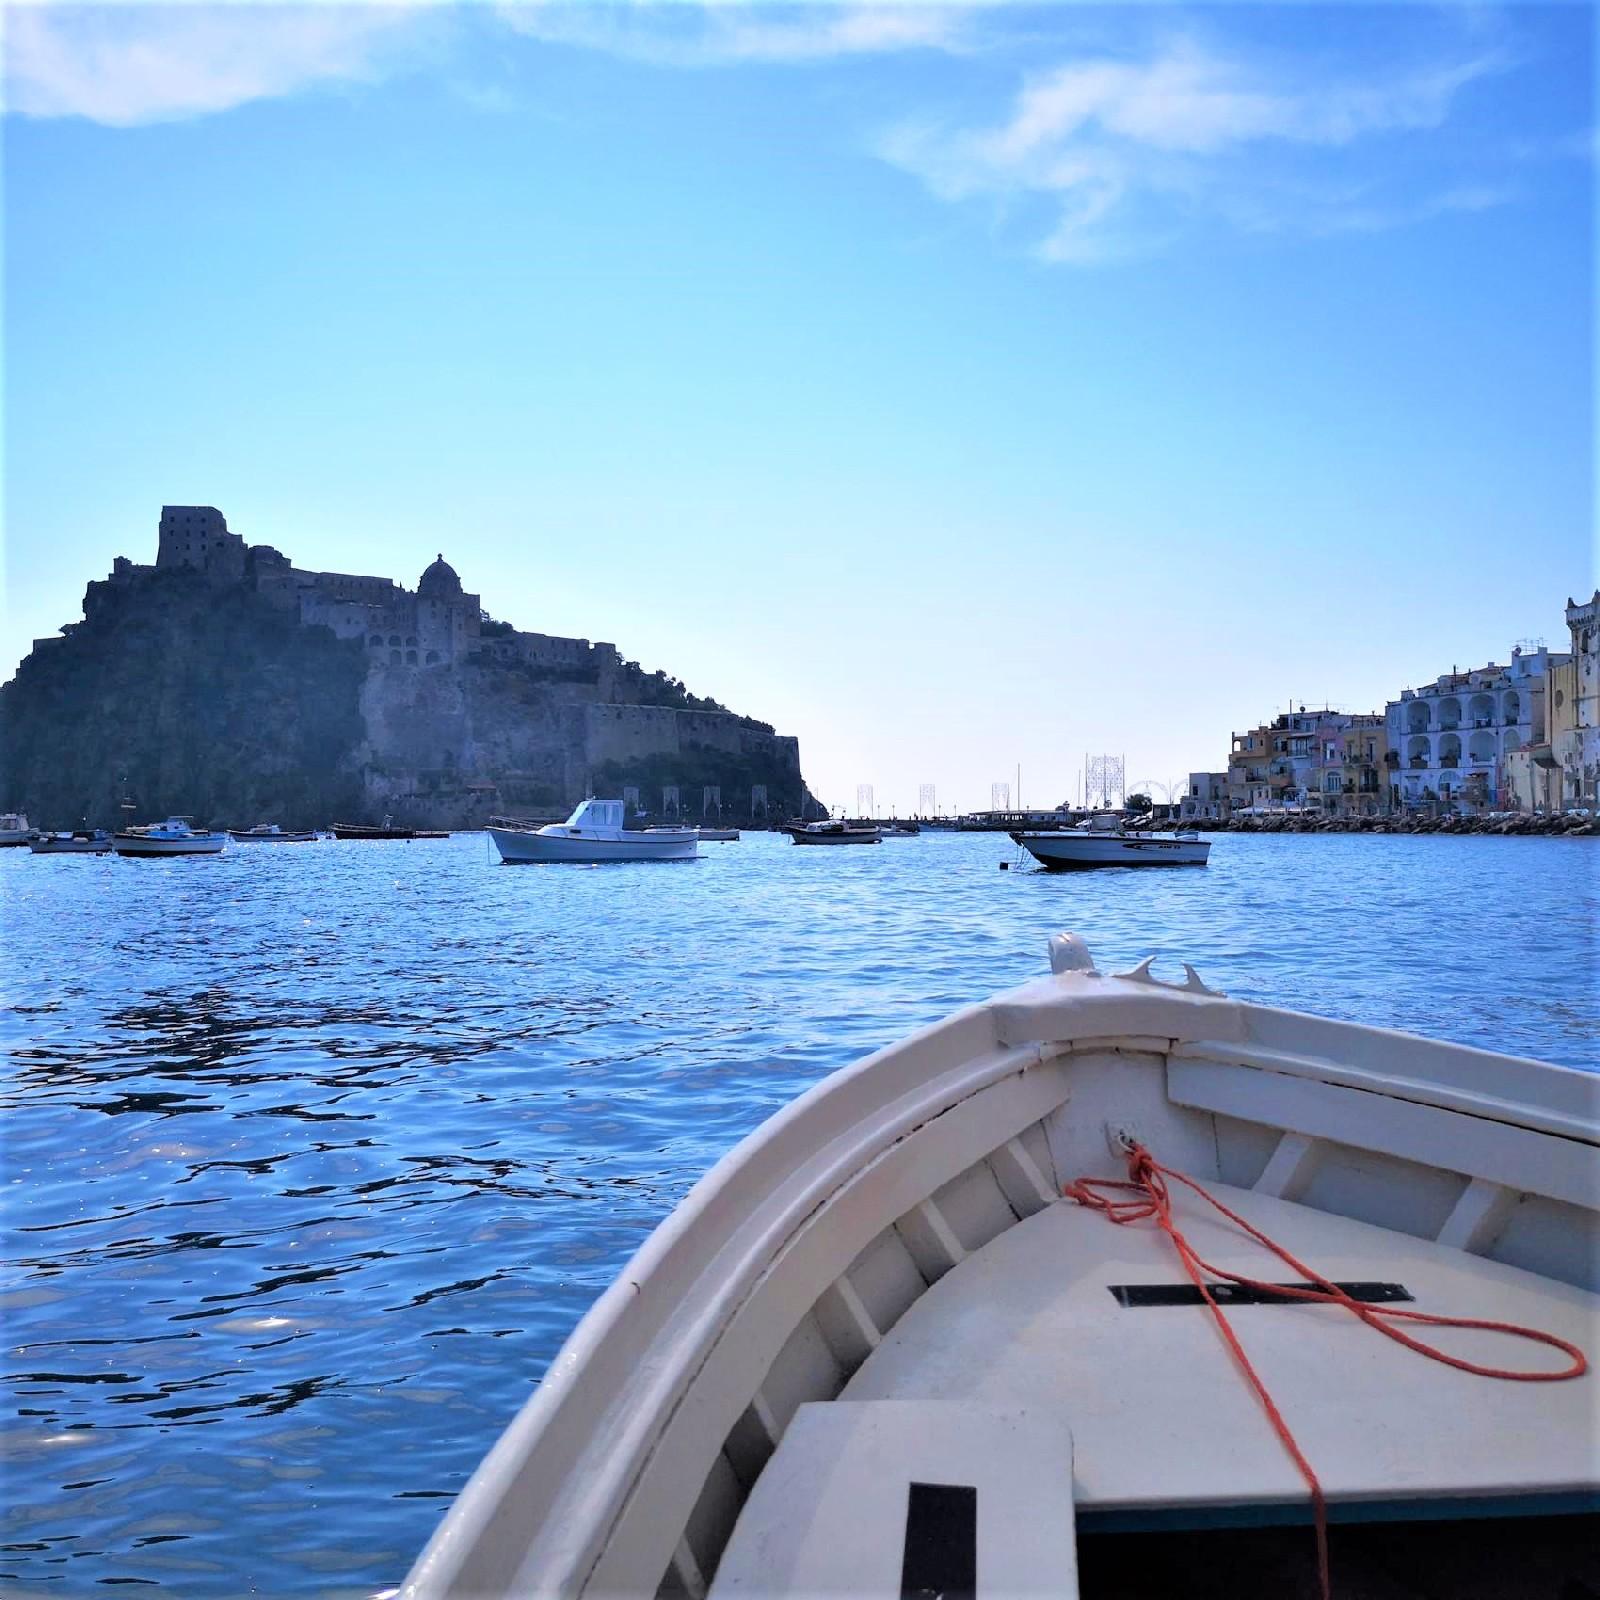 ischia-things-to-do-castello-aragonese